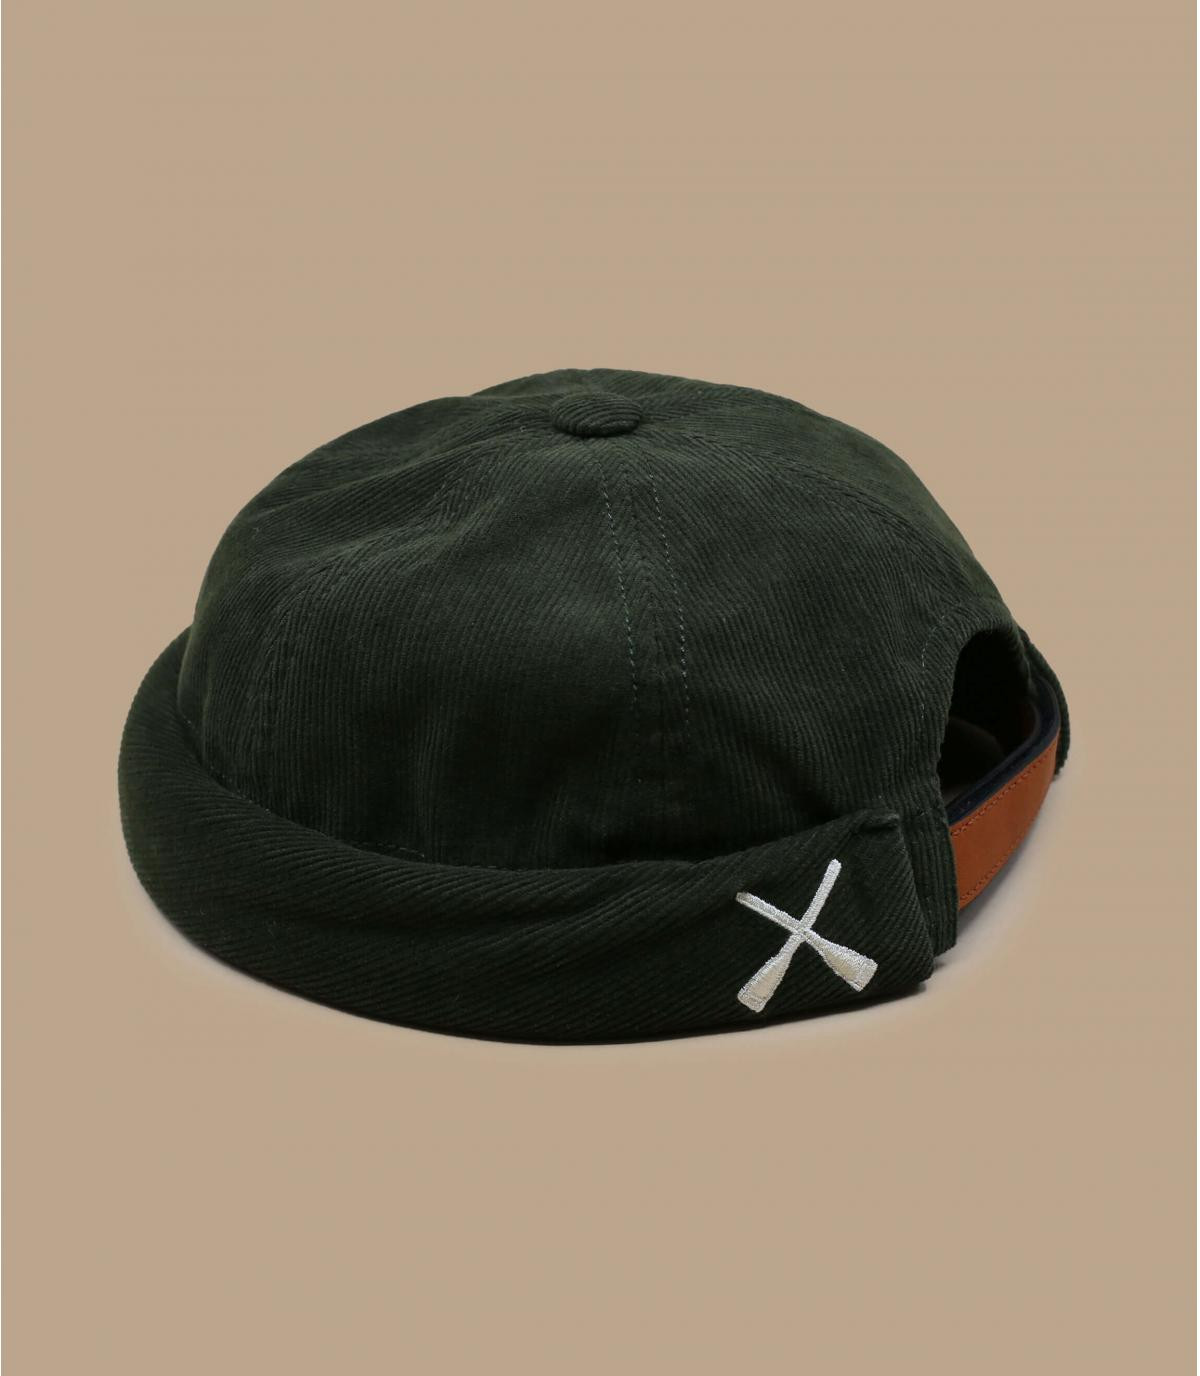 green corduroy beret